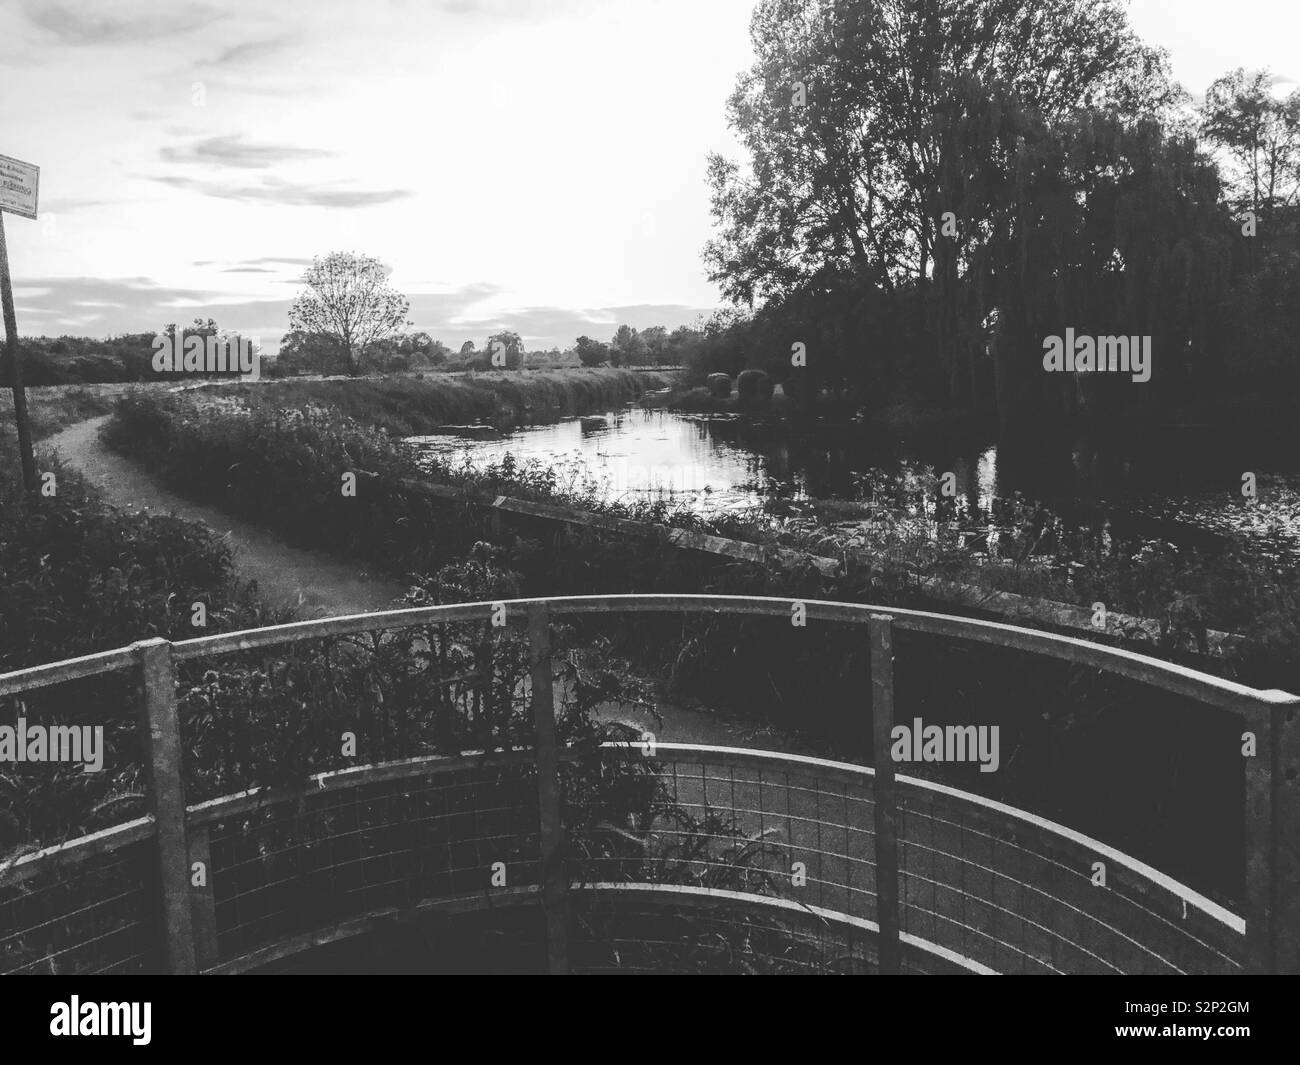 Black & white river side views - Stock Image